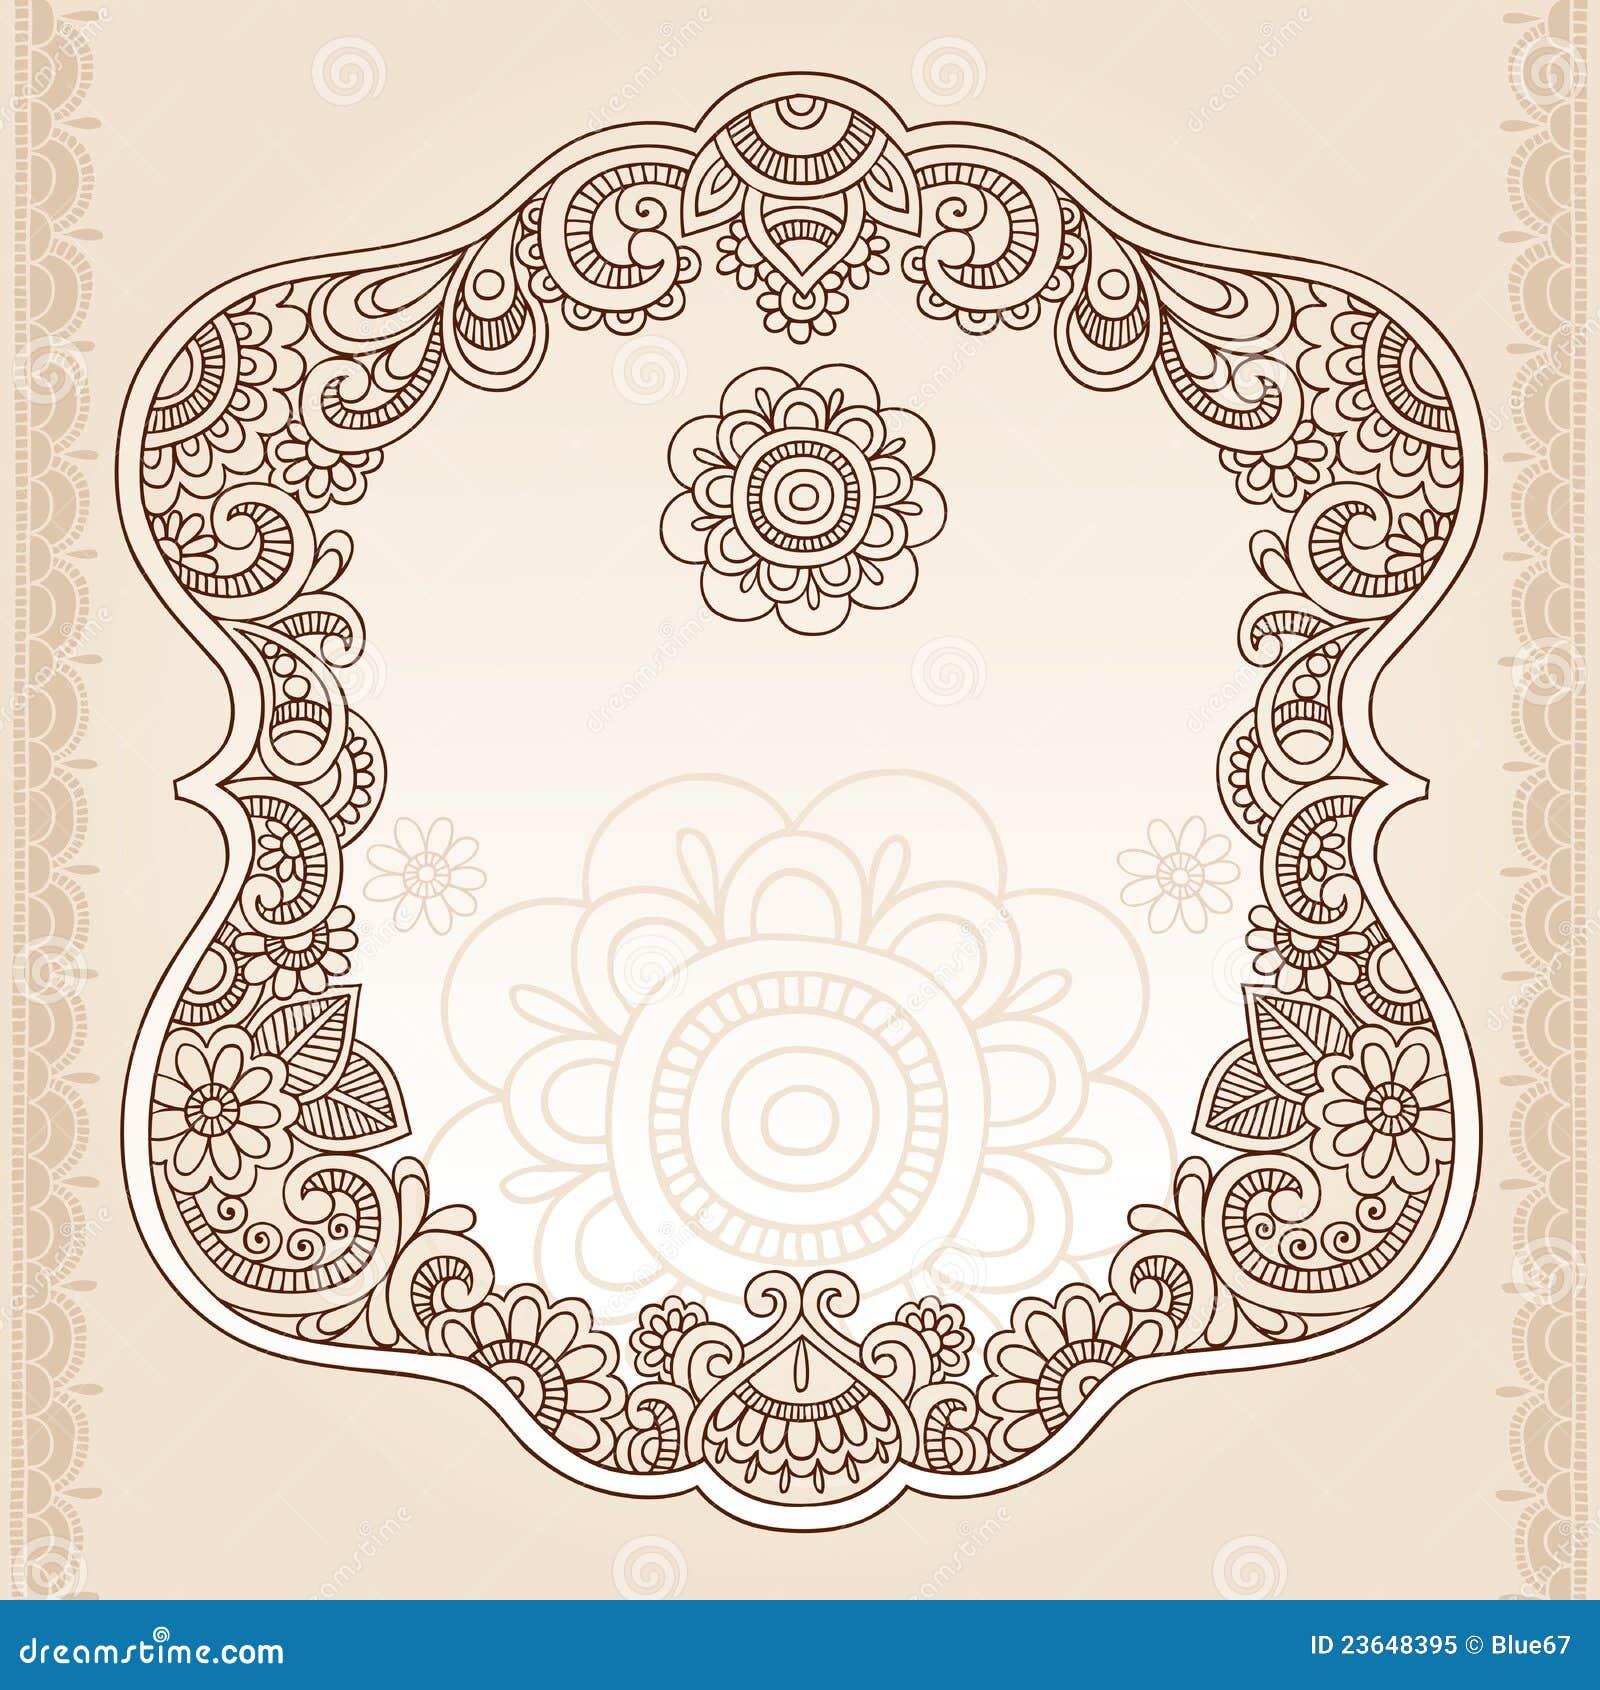 Lace doily henna flower vector illustration design - Henna Tattoo Flower Frame Doodle Vector Design Royalty Free Stock